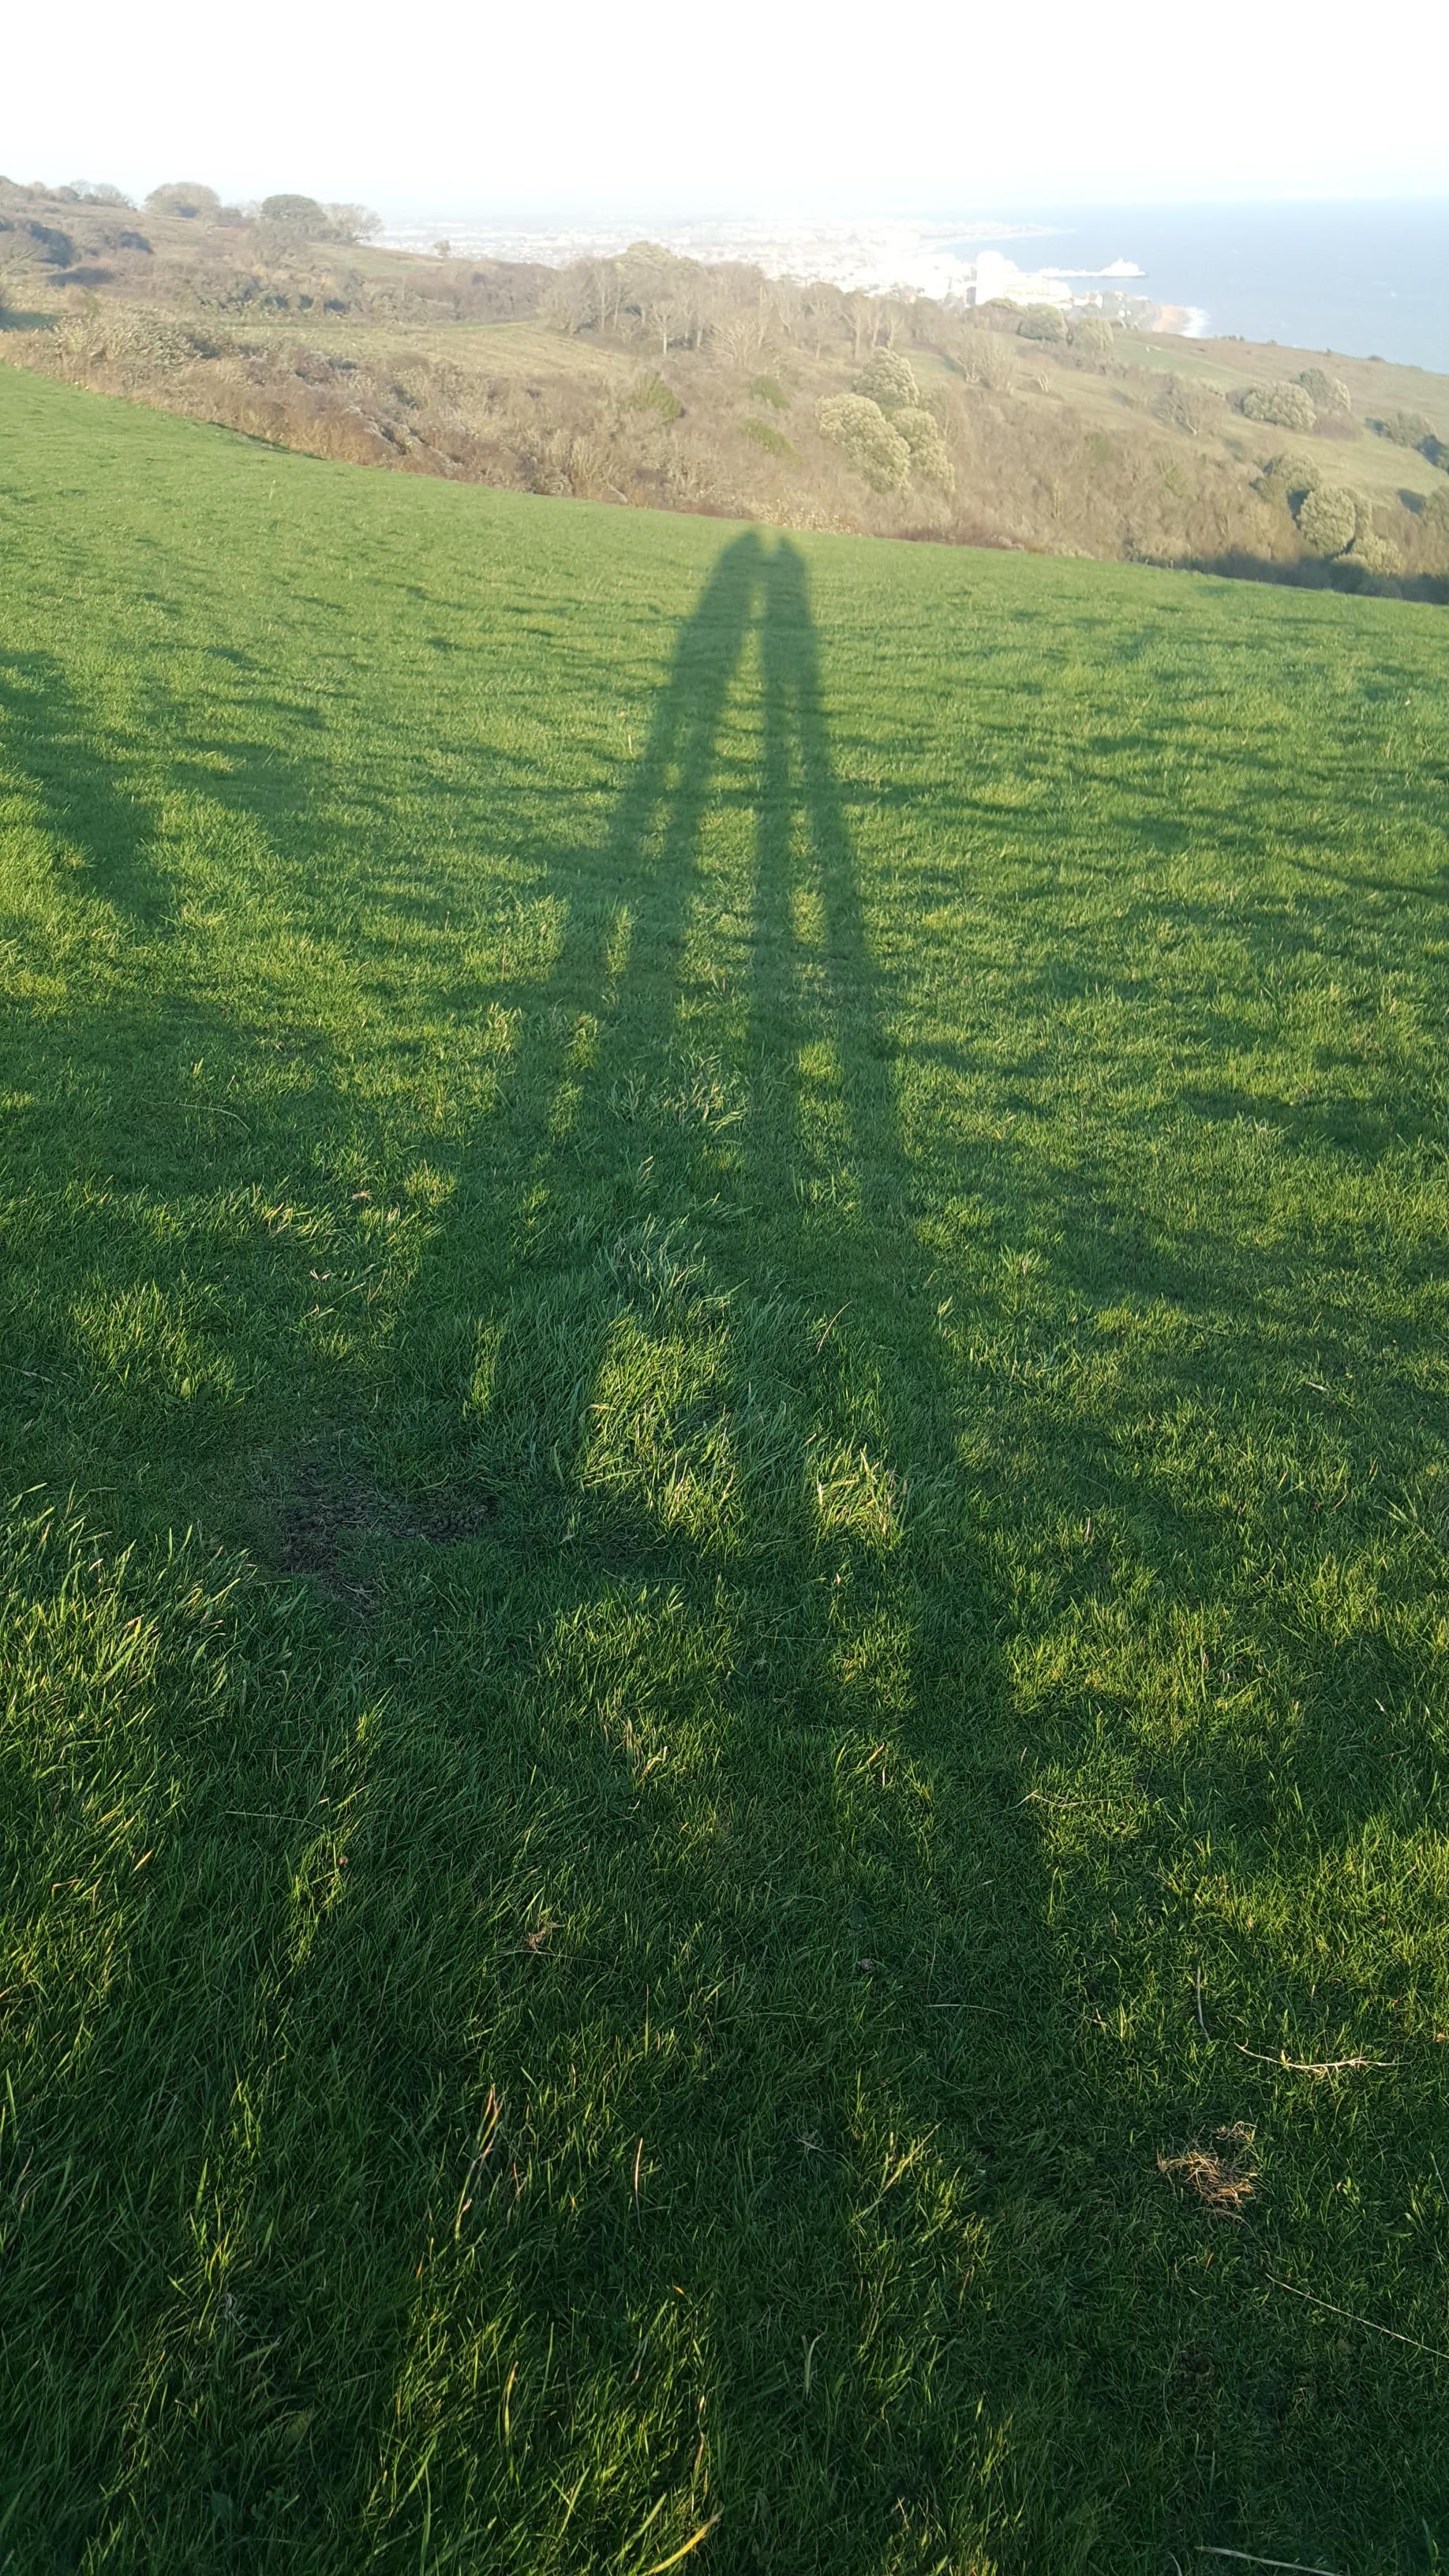 long legs shadows